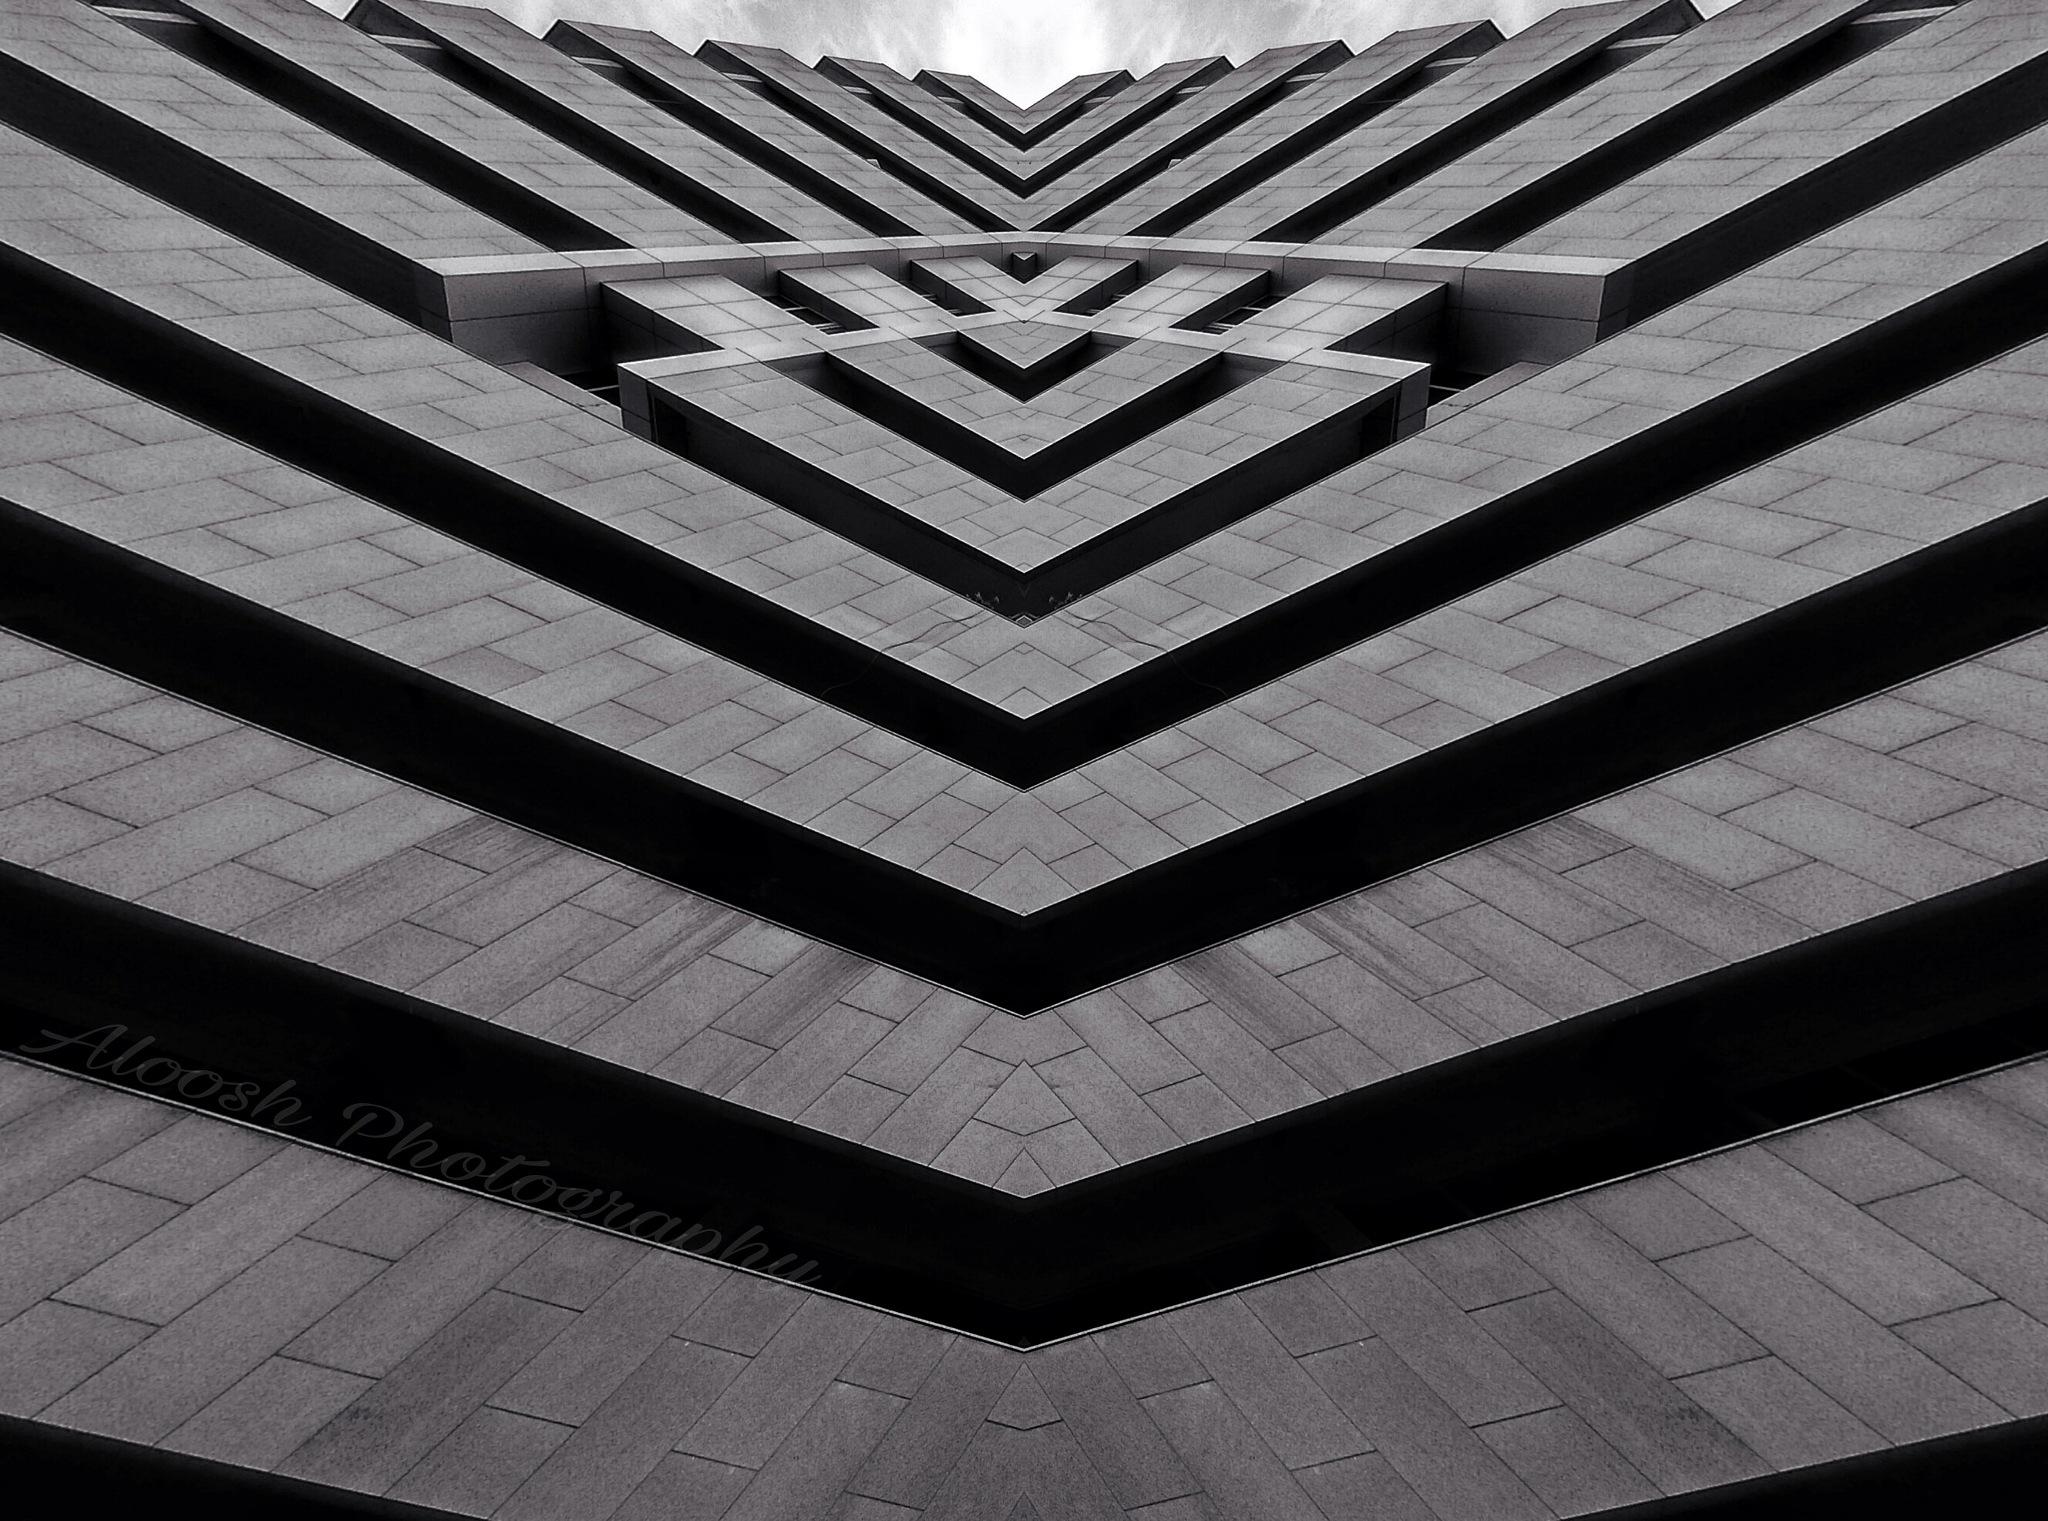 zooom by Ali Senged